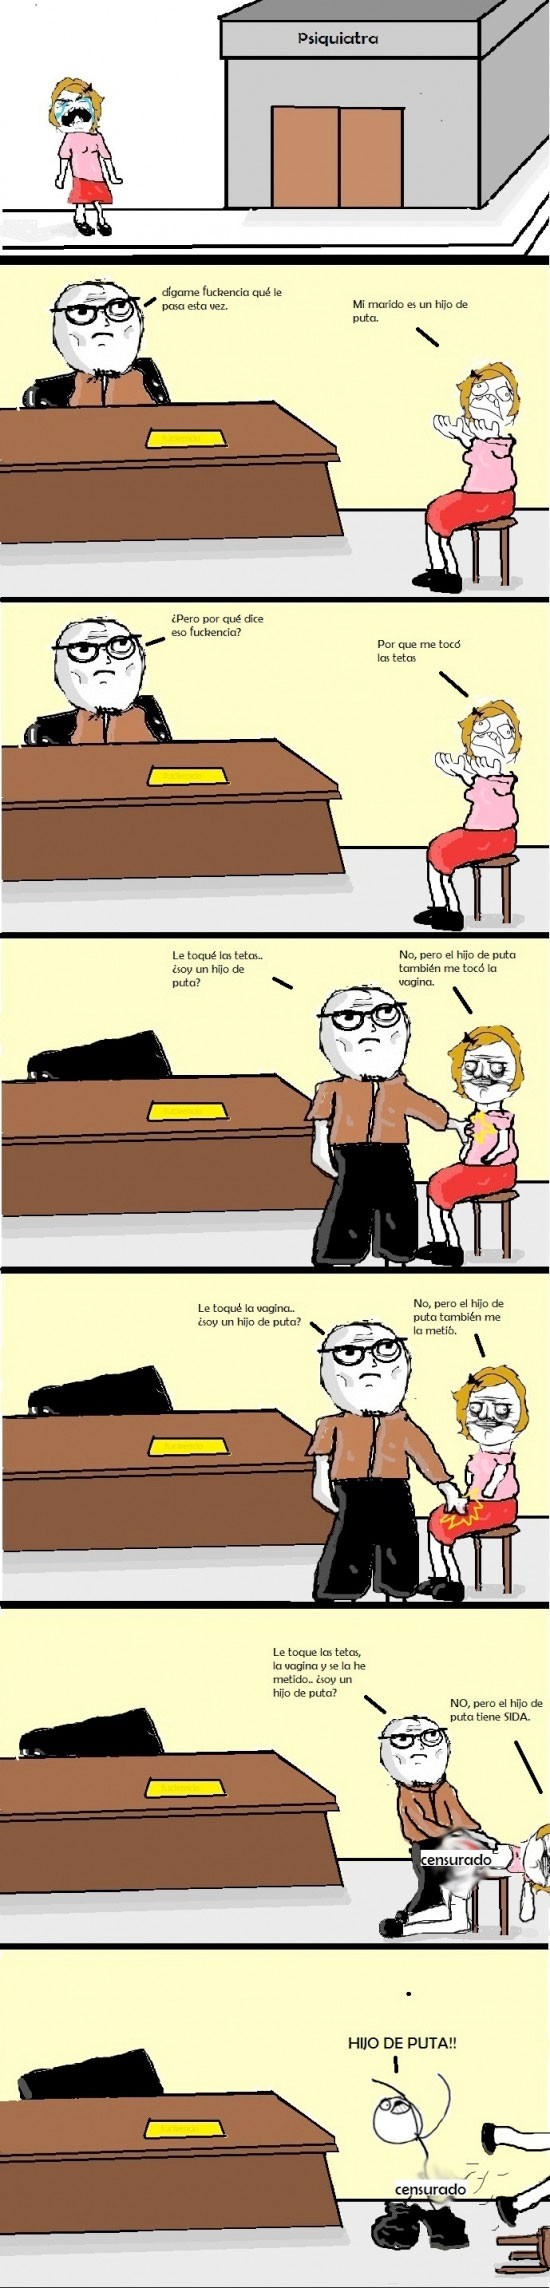 desk flip,marido,pecho,psiquiatra,sida